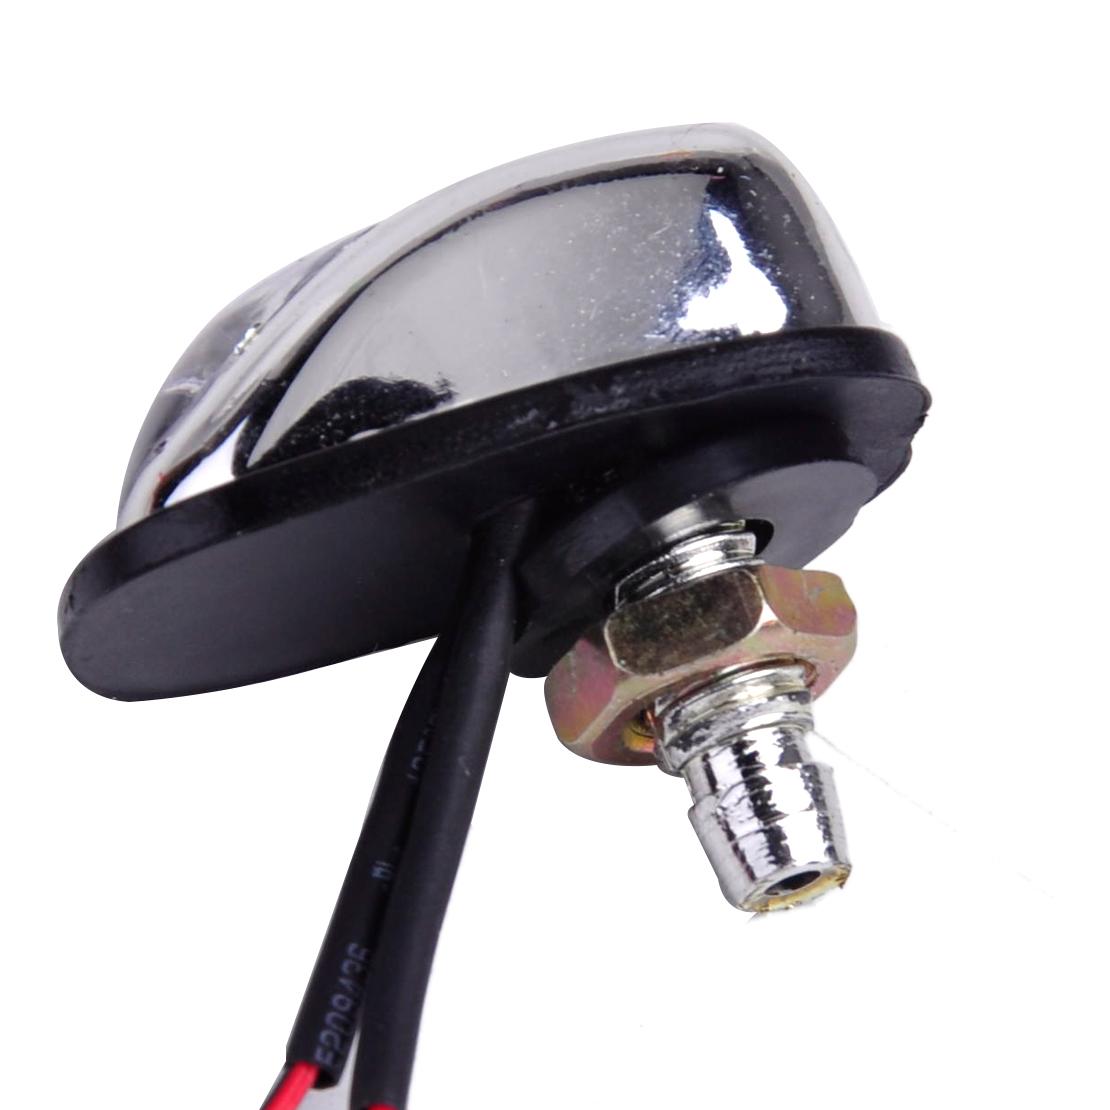 Pcs universal windshield washer wiper jet water spray